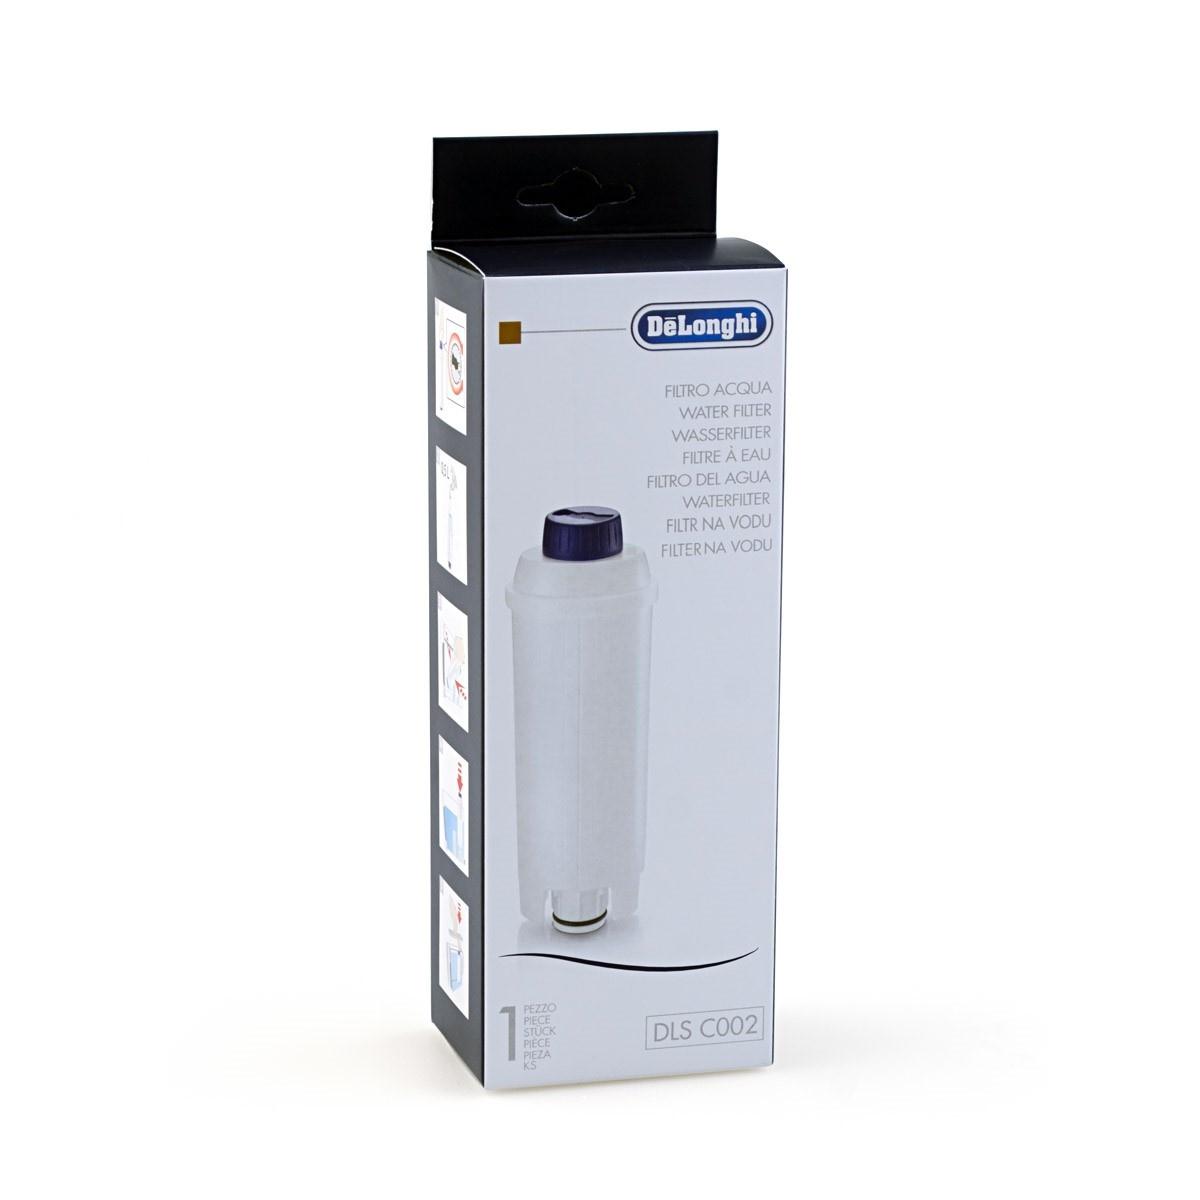 DeLonghi waterfilter-1